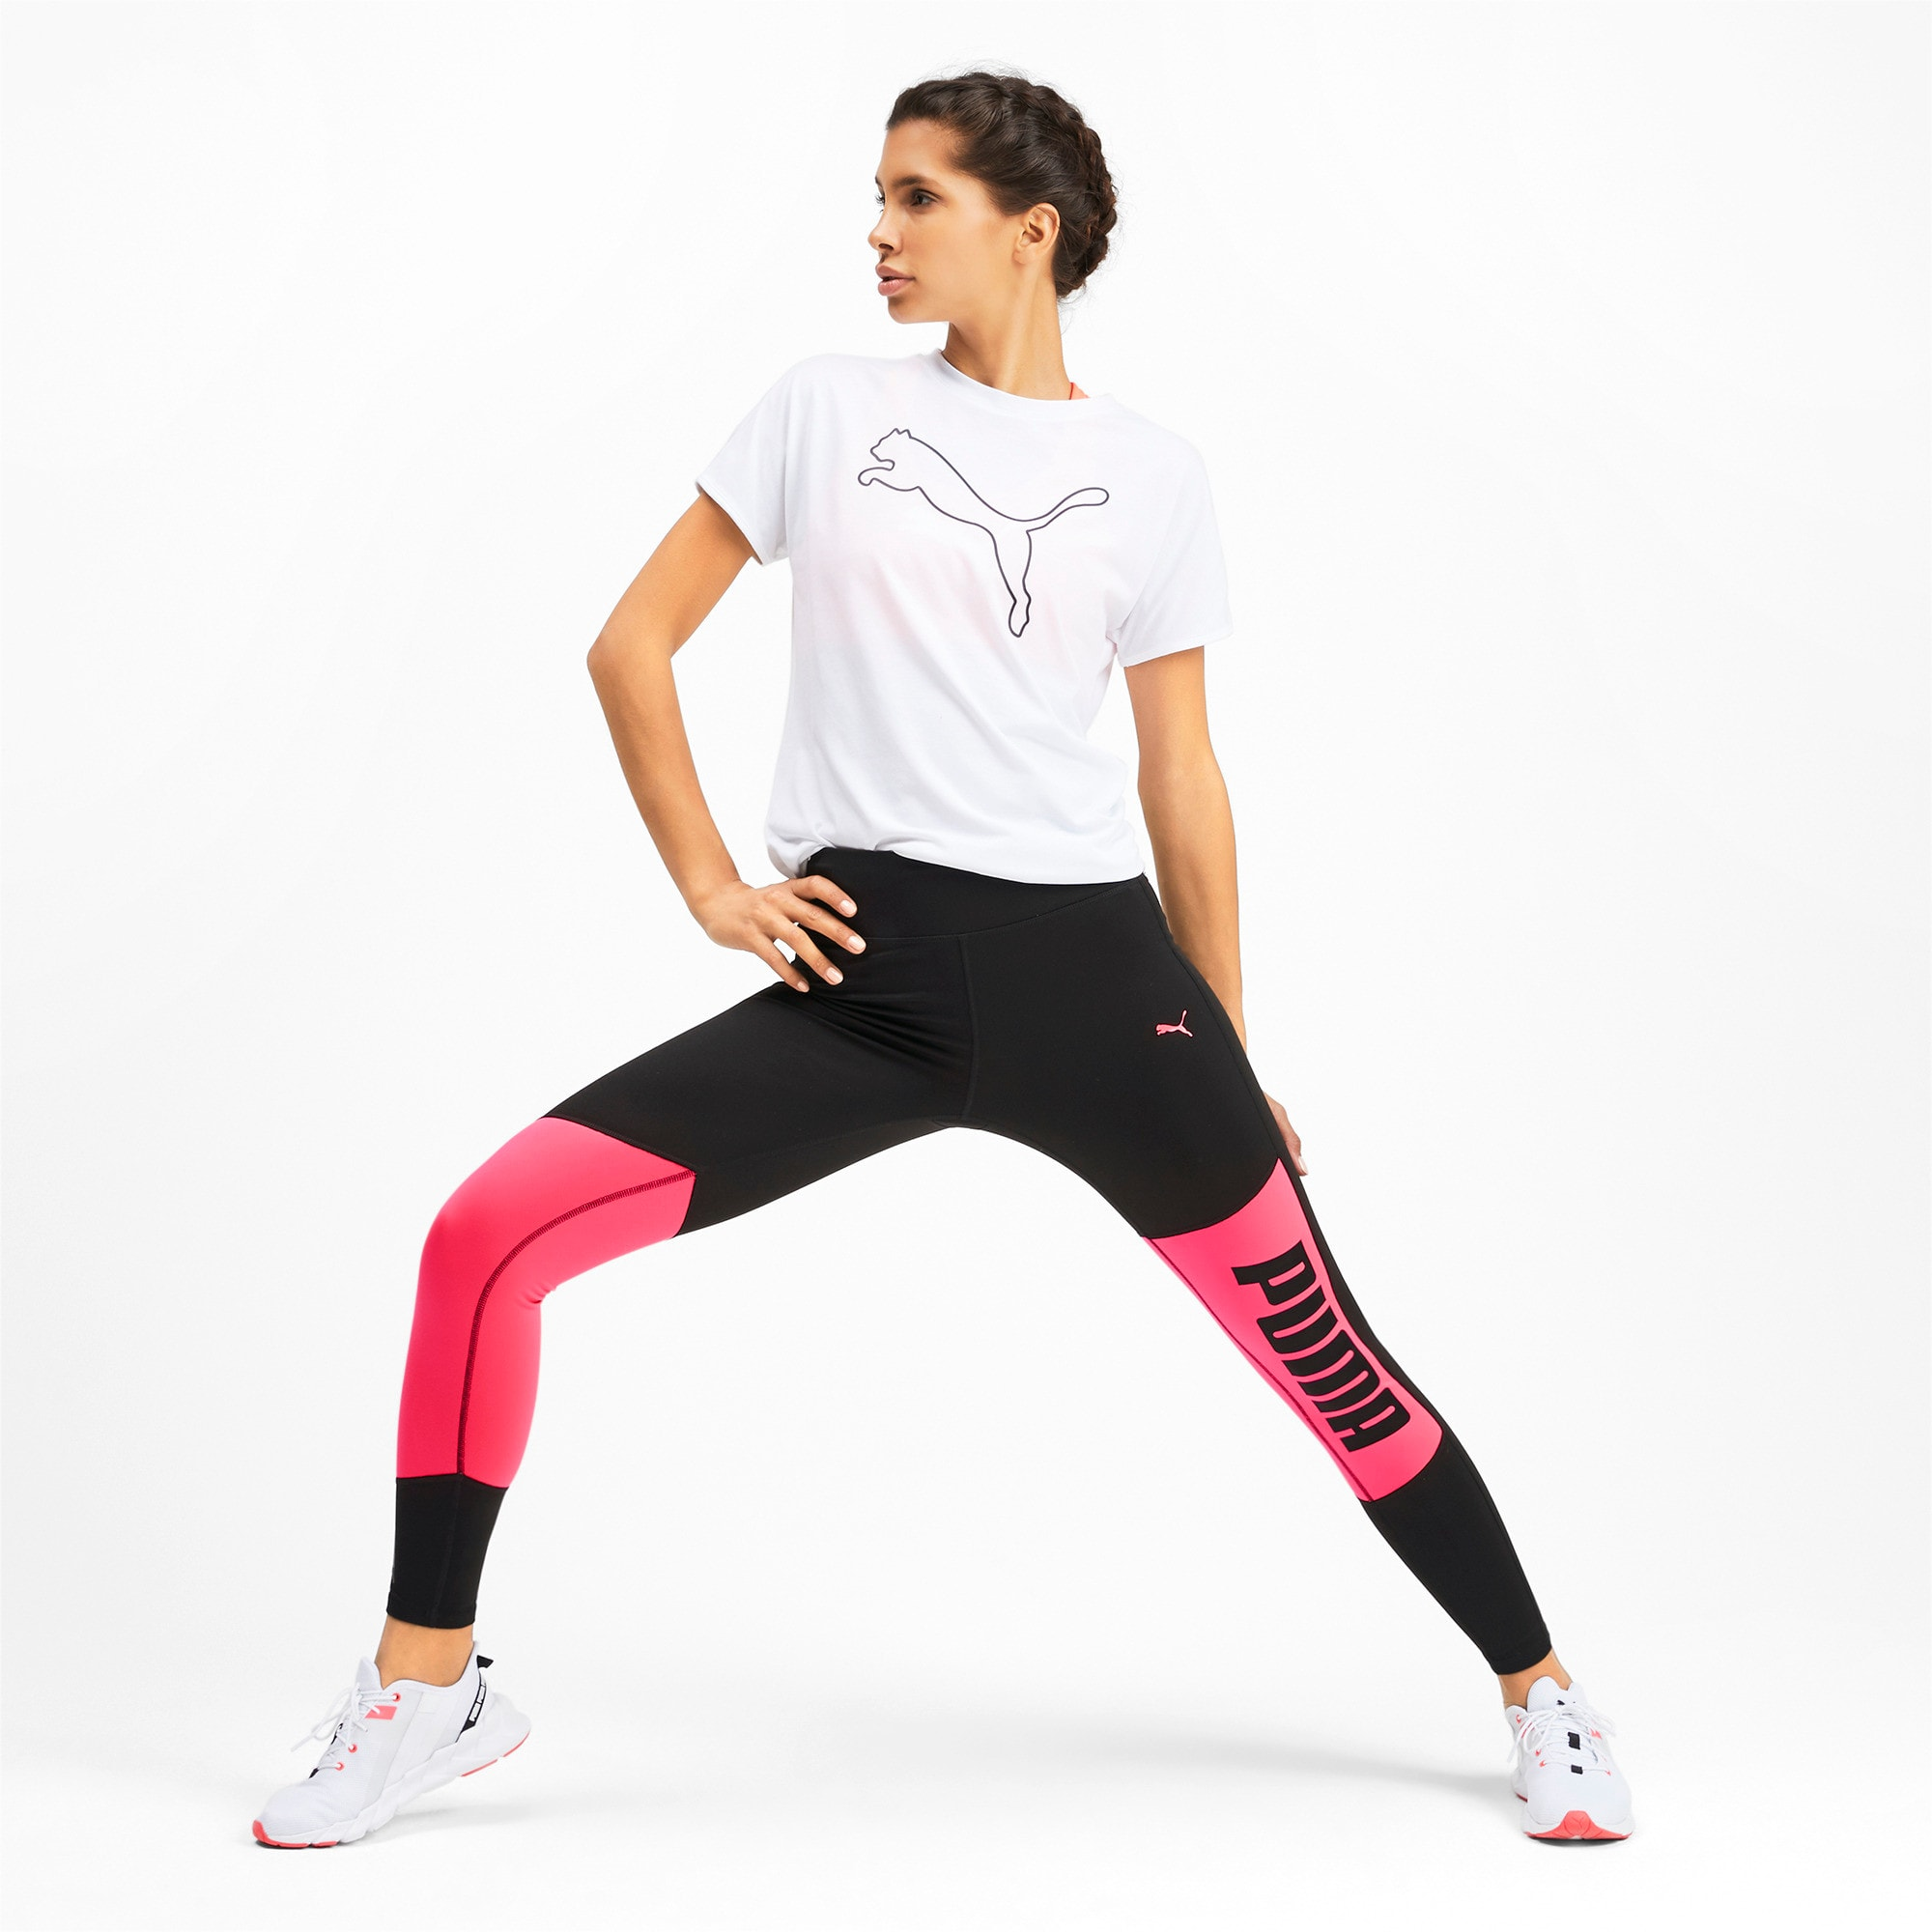 Thumbnail 3 of Logo 7/8 Graphic Women's Training Leggings, Puma Black-Pink Alert, medium